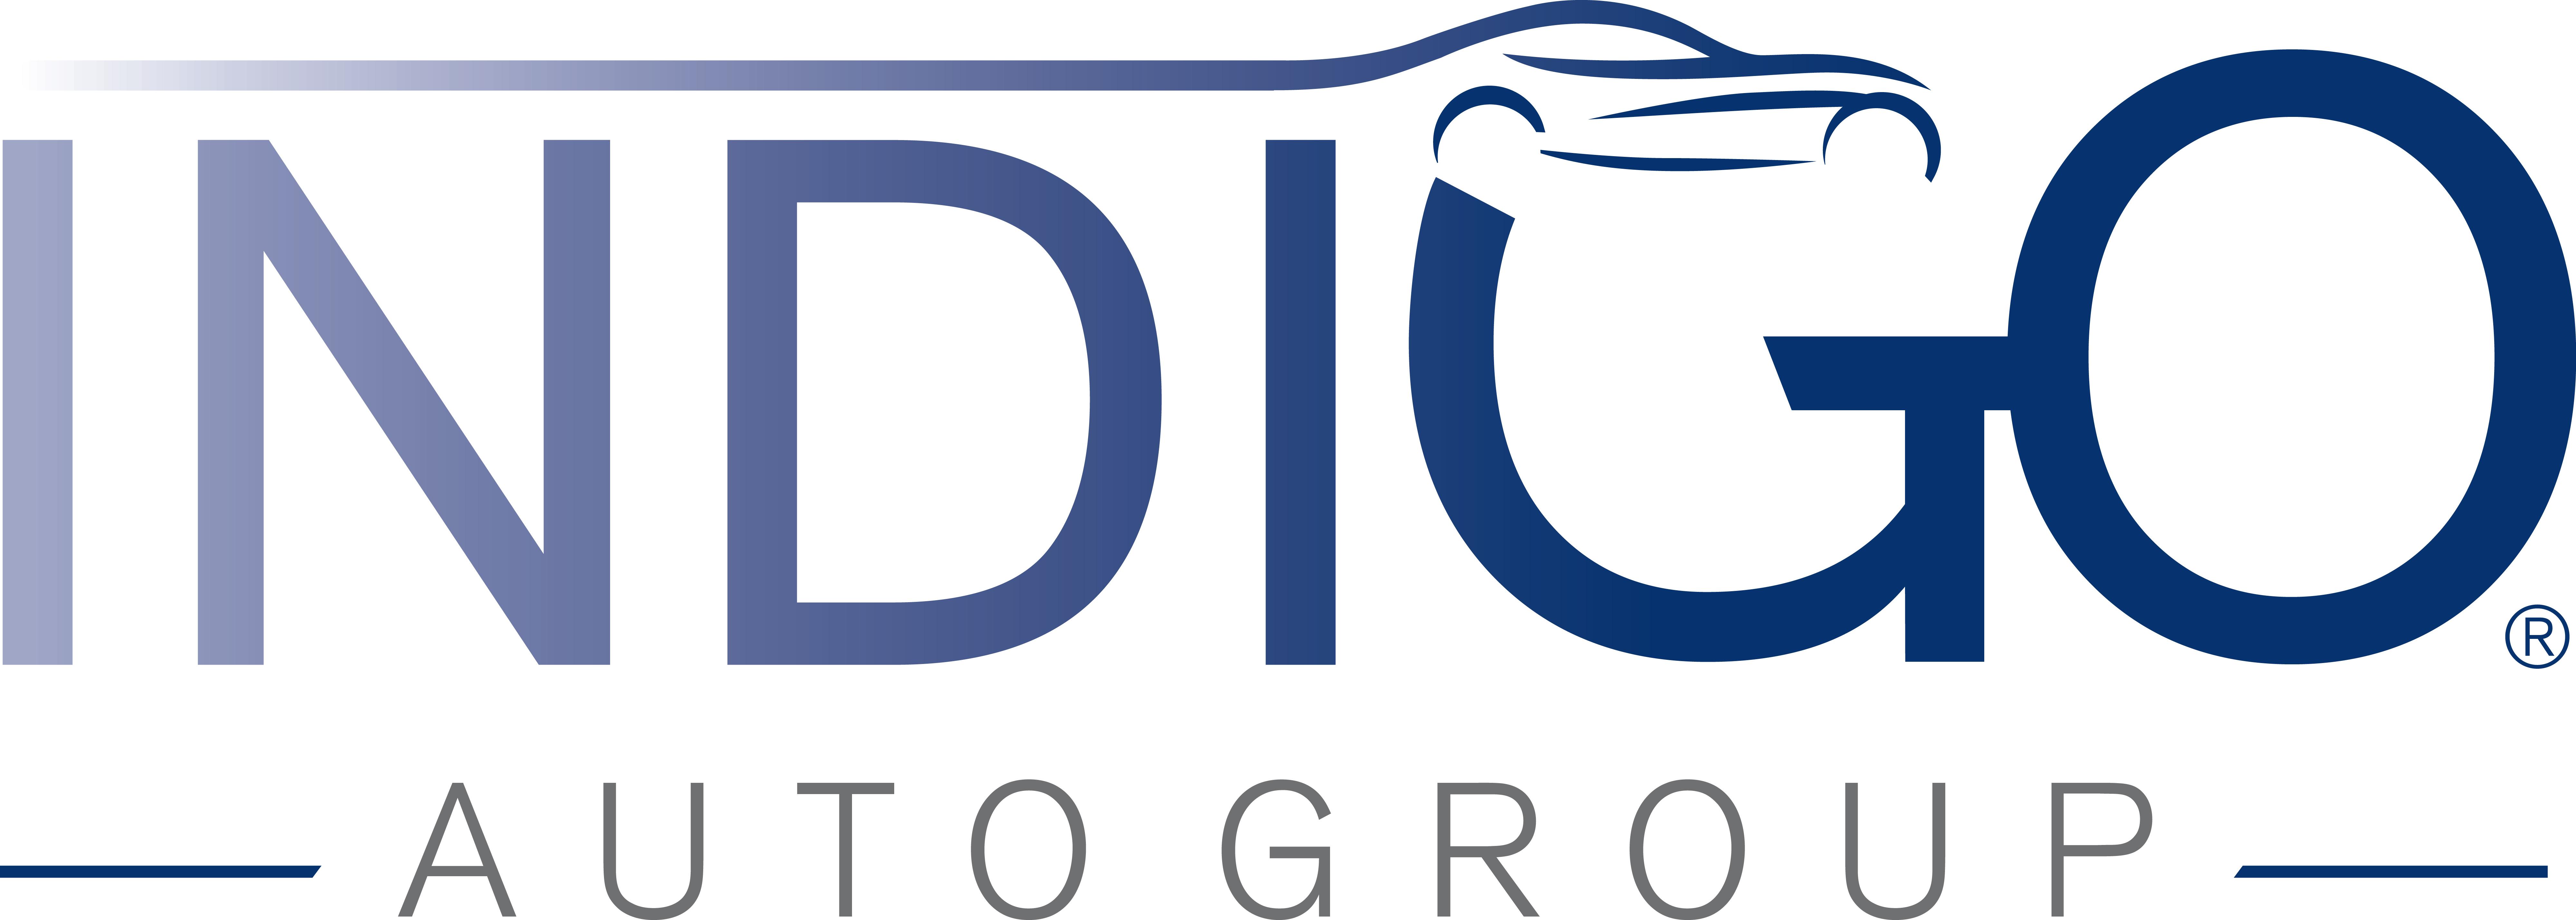 Indigo Auto Group Acquires Porsche Franchise In St Louis Mo Business Wire